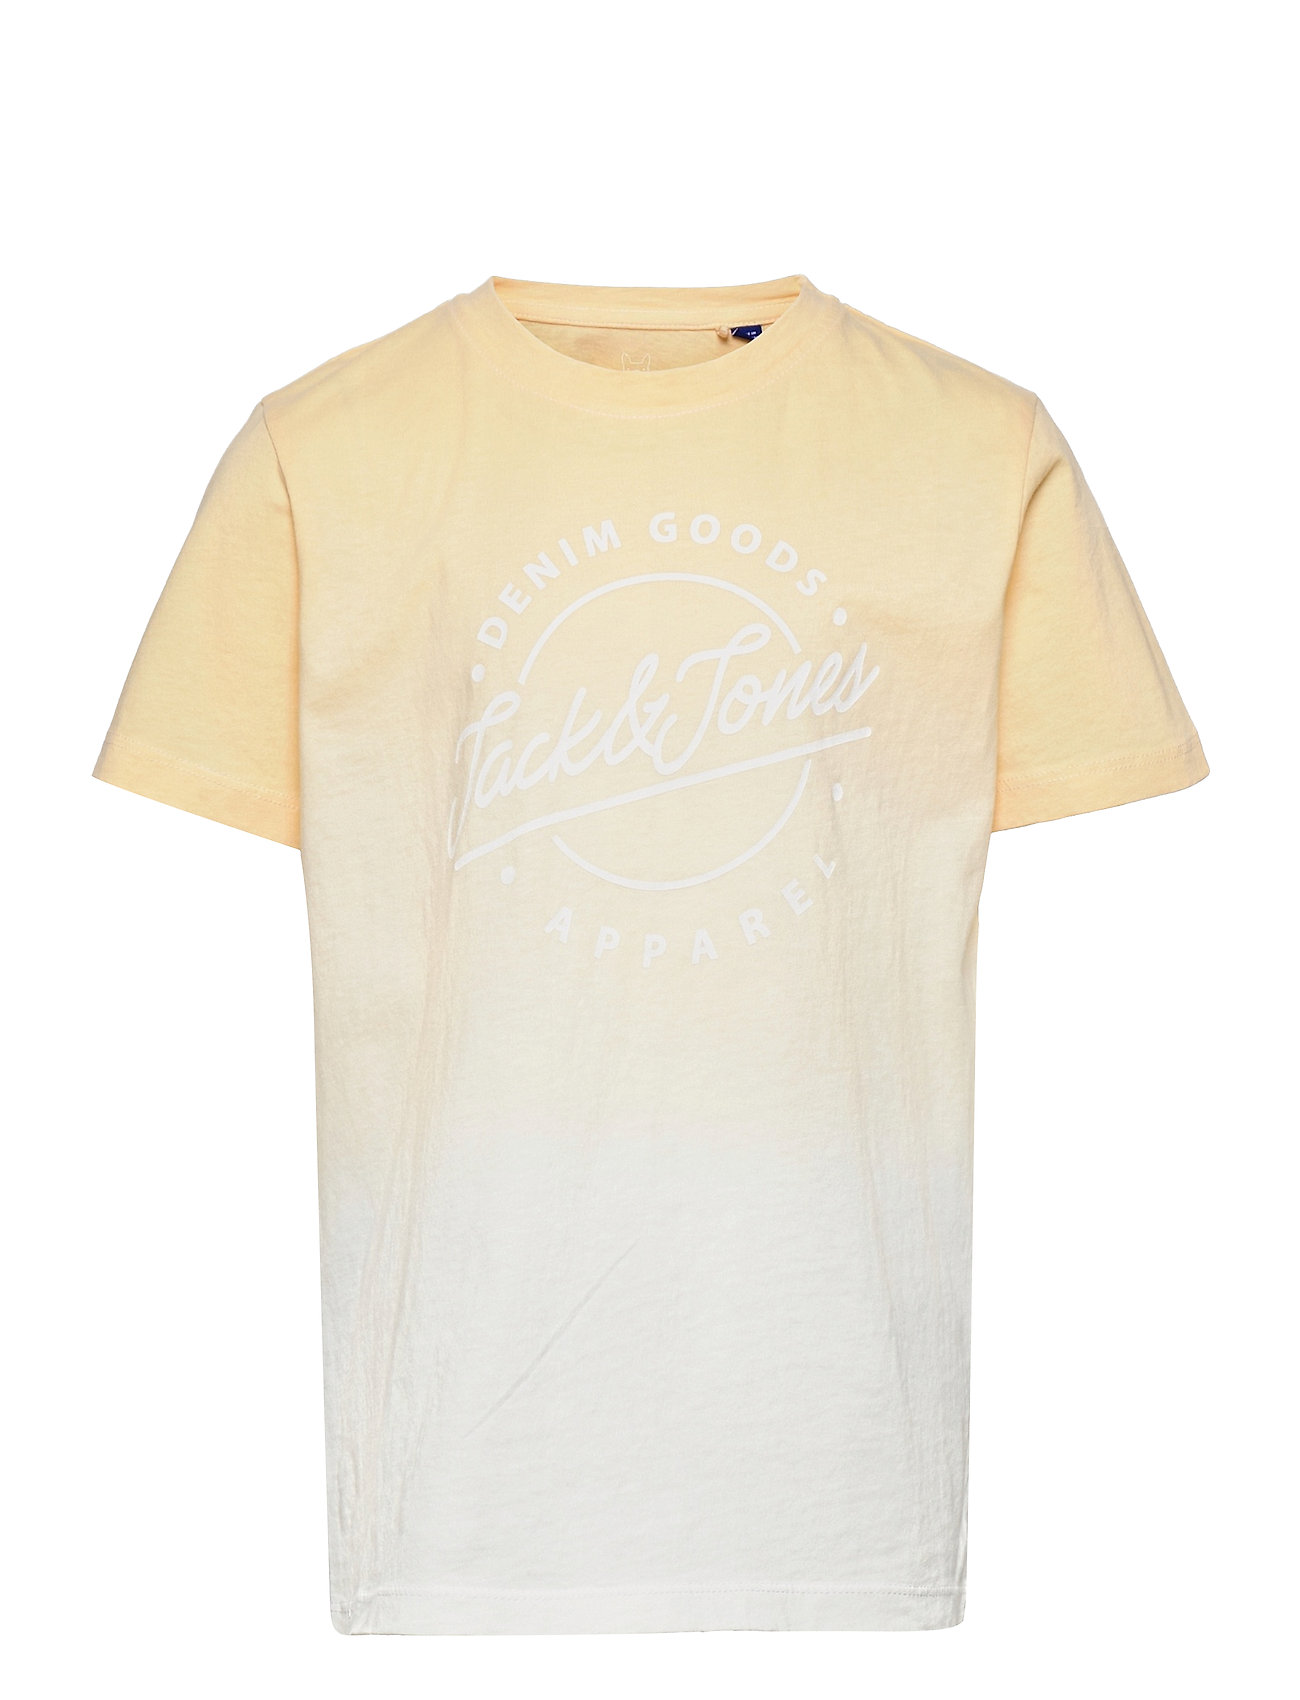 Jjtim Tee Ss Crew Neck Jr T-shirt Hvid Jack & J S